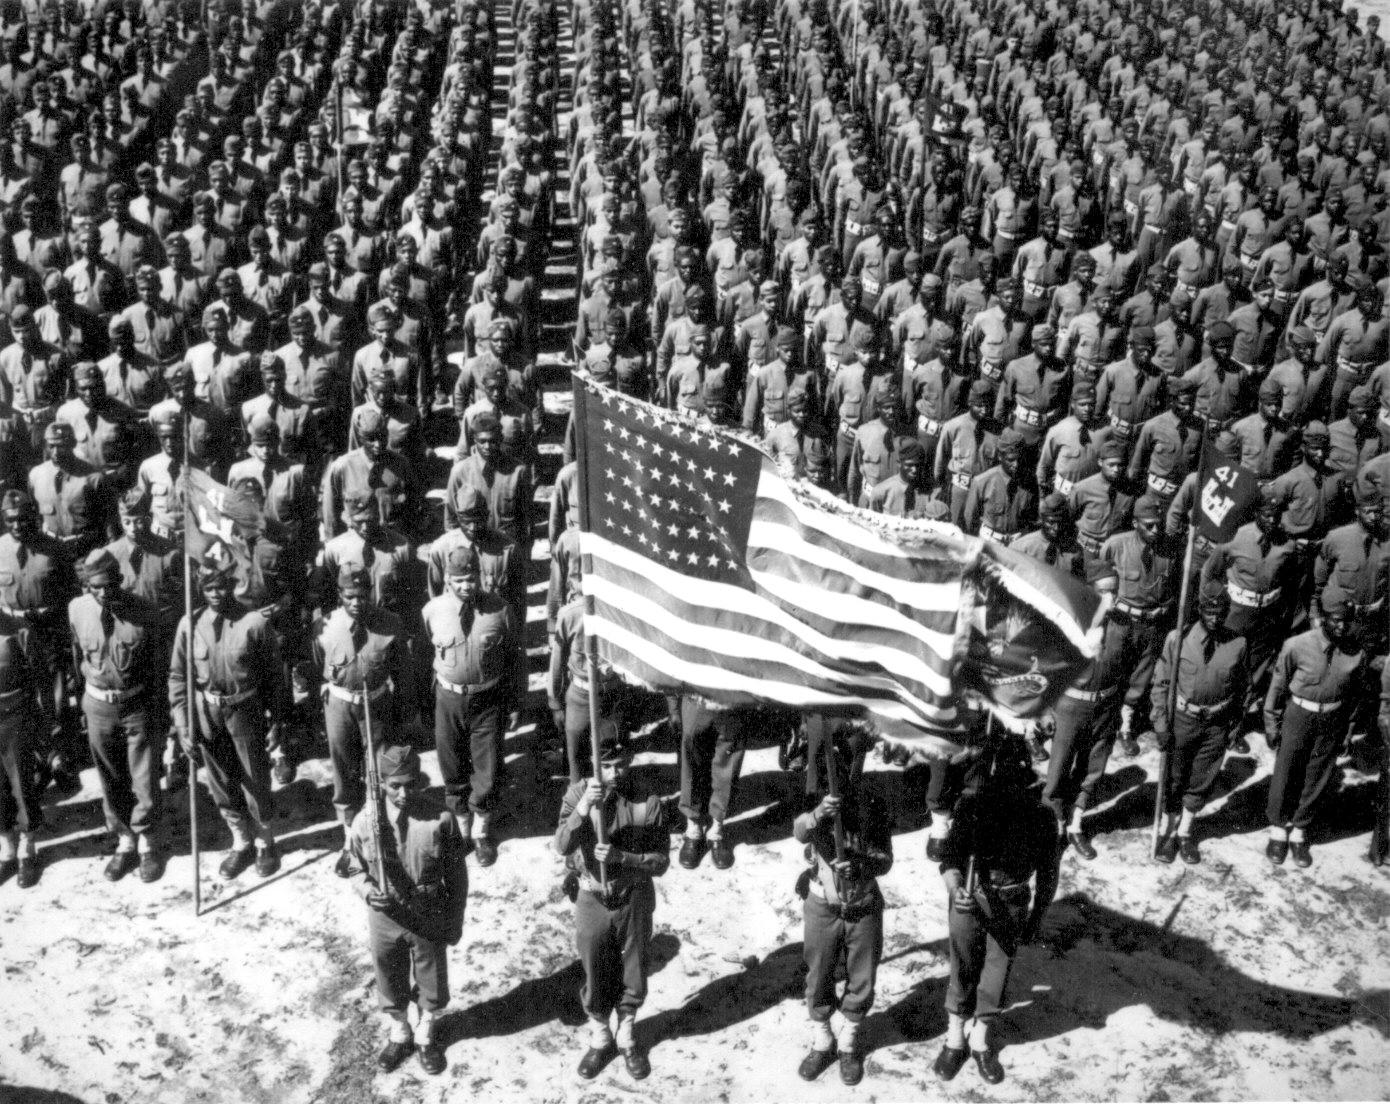 studies in social psychology in world war ii the work of the war